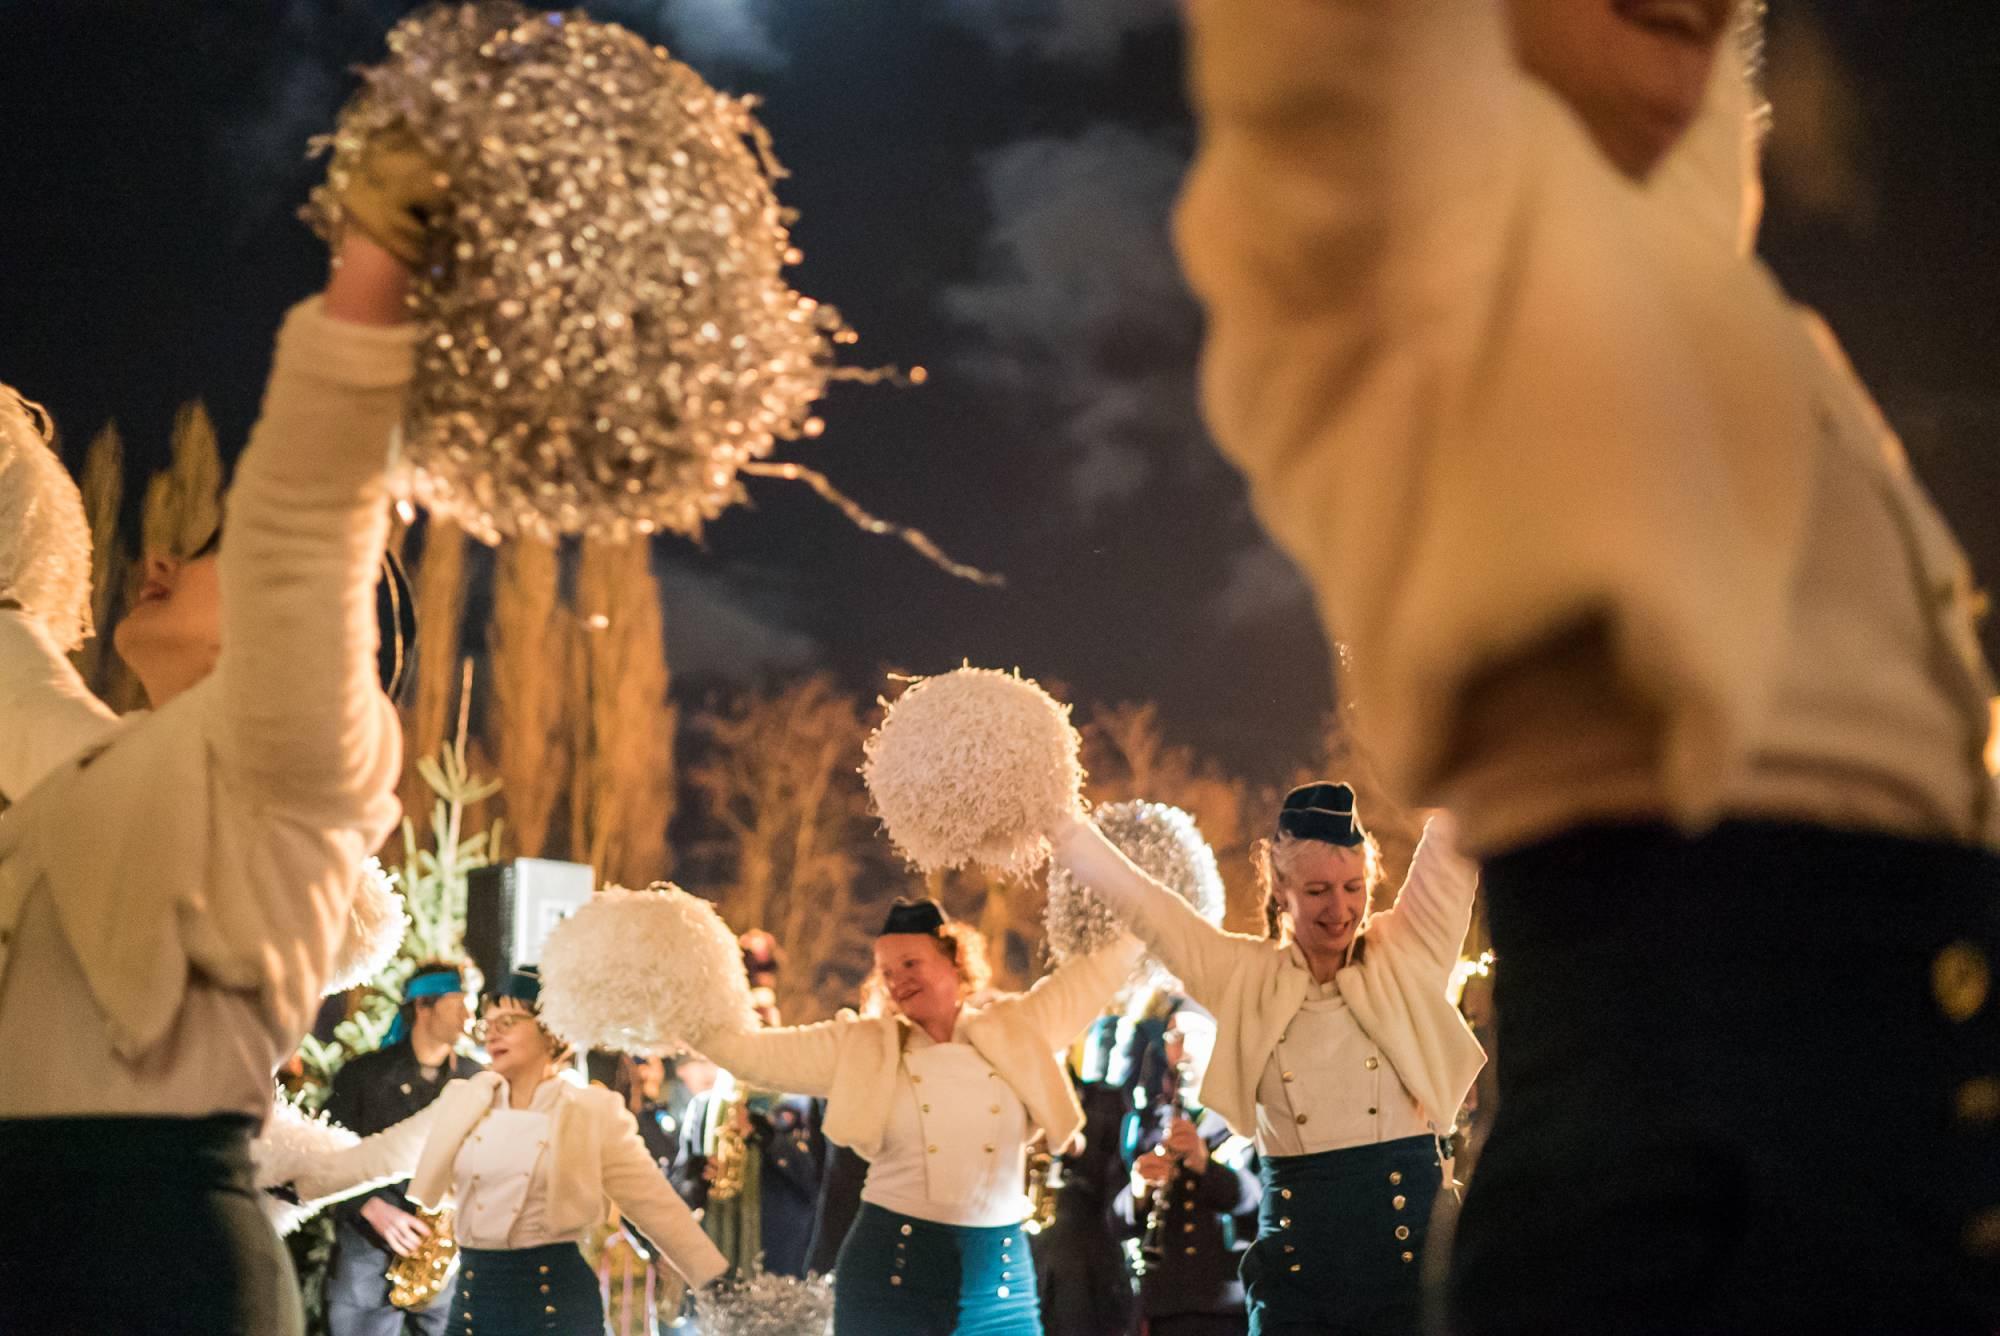 Wintervuur winter festival